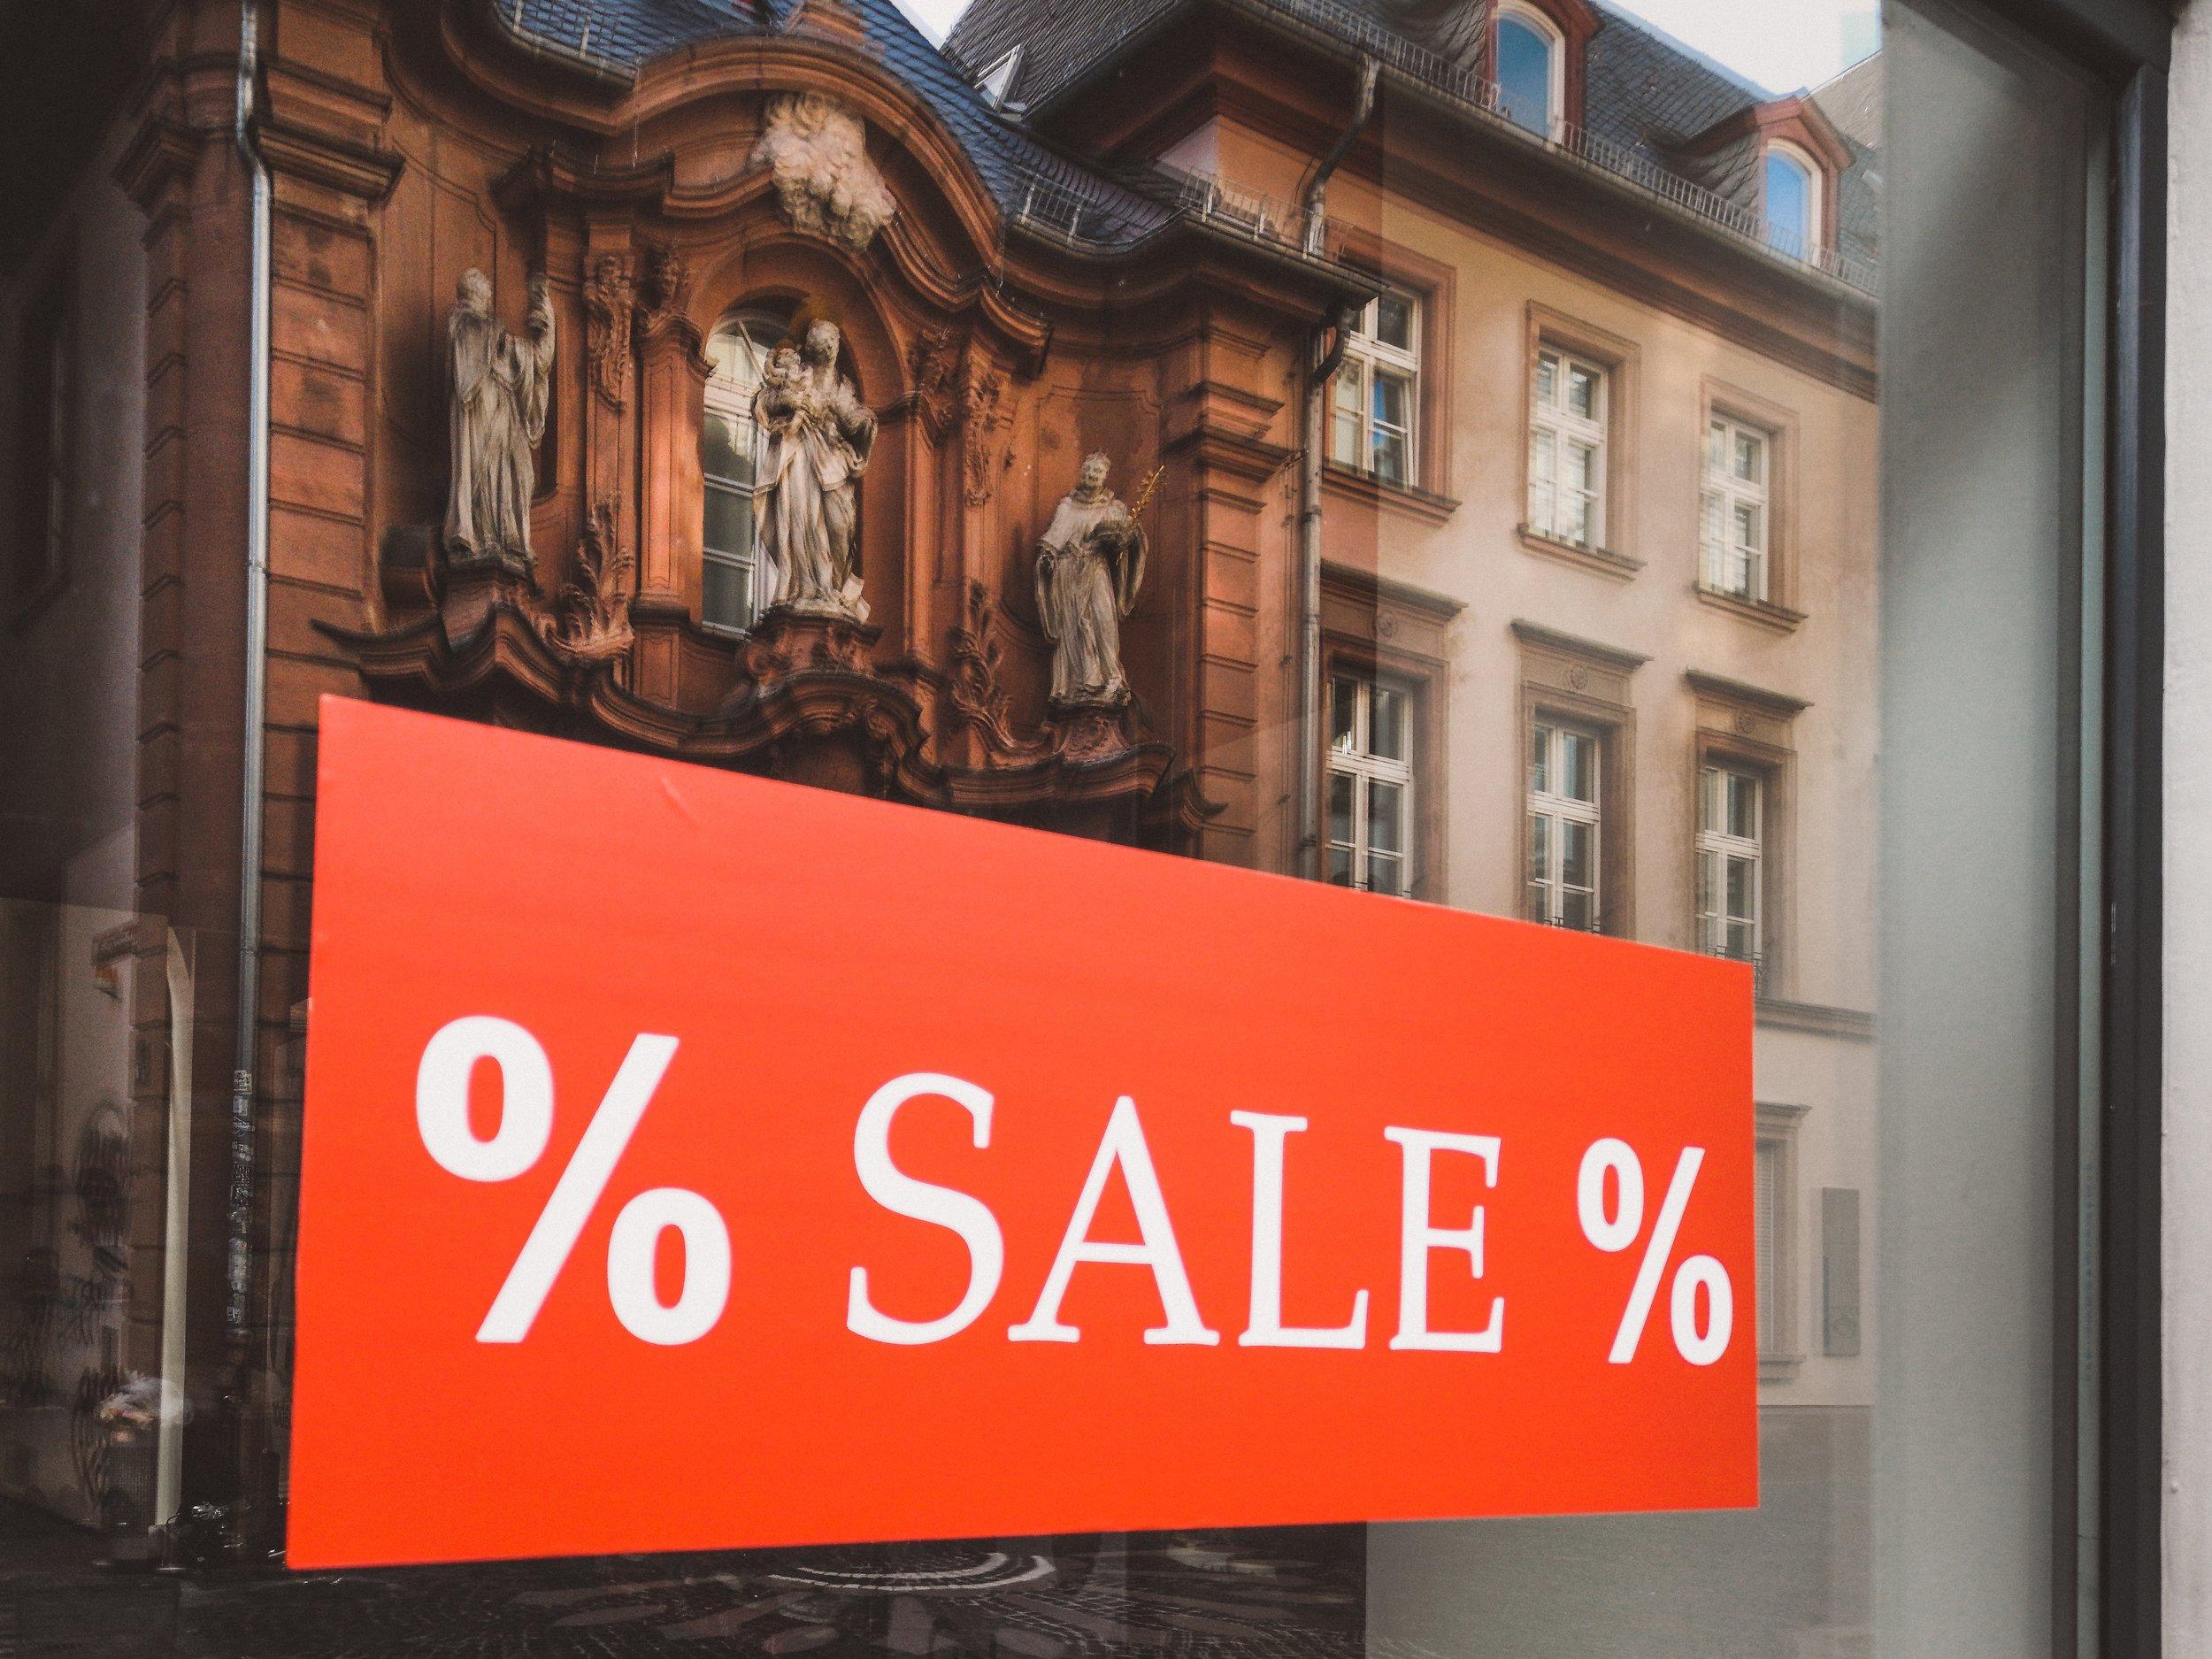 image courtesy of Benedikt Geyer via Unsplash.com